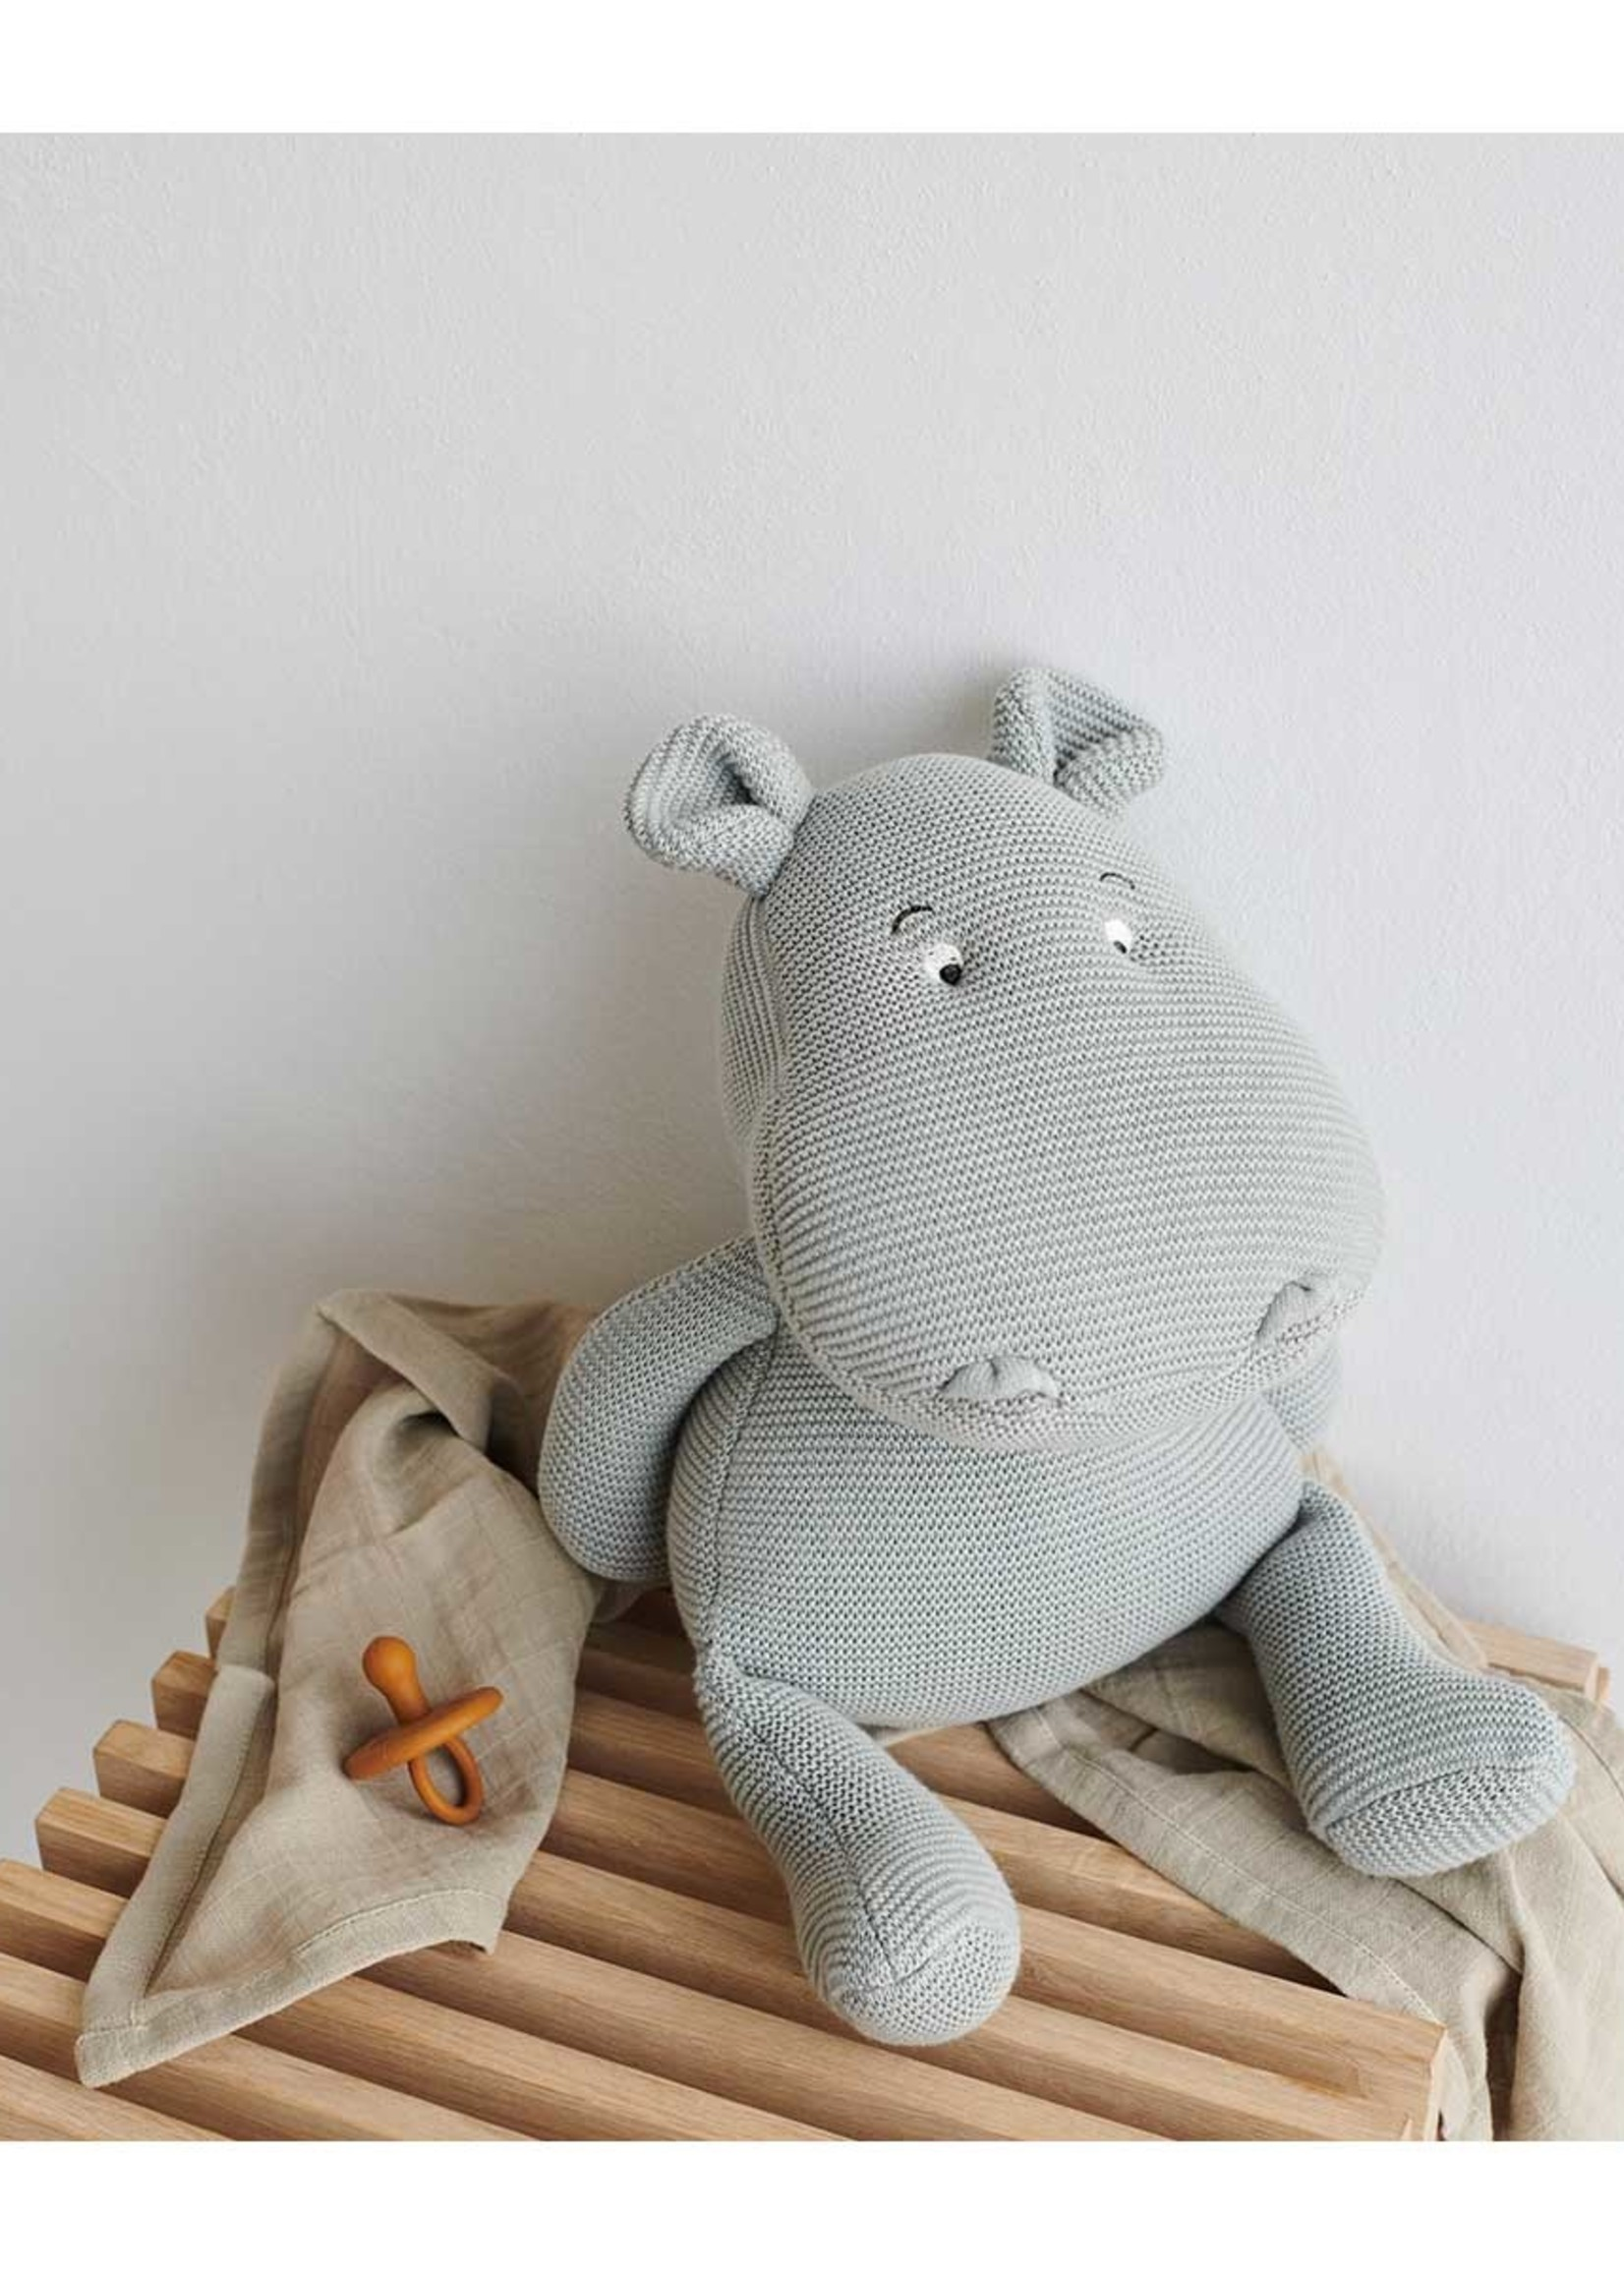 liewood Liewood -LW14105 Bo hippo 100% cotton organic